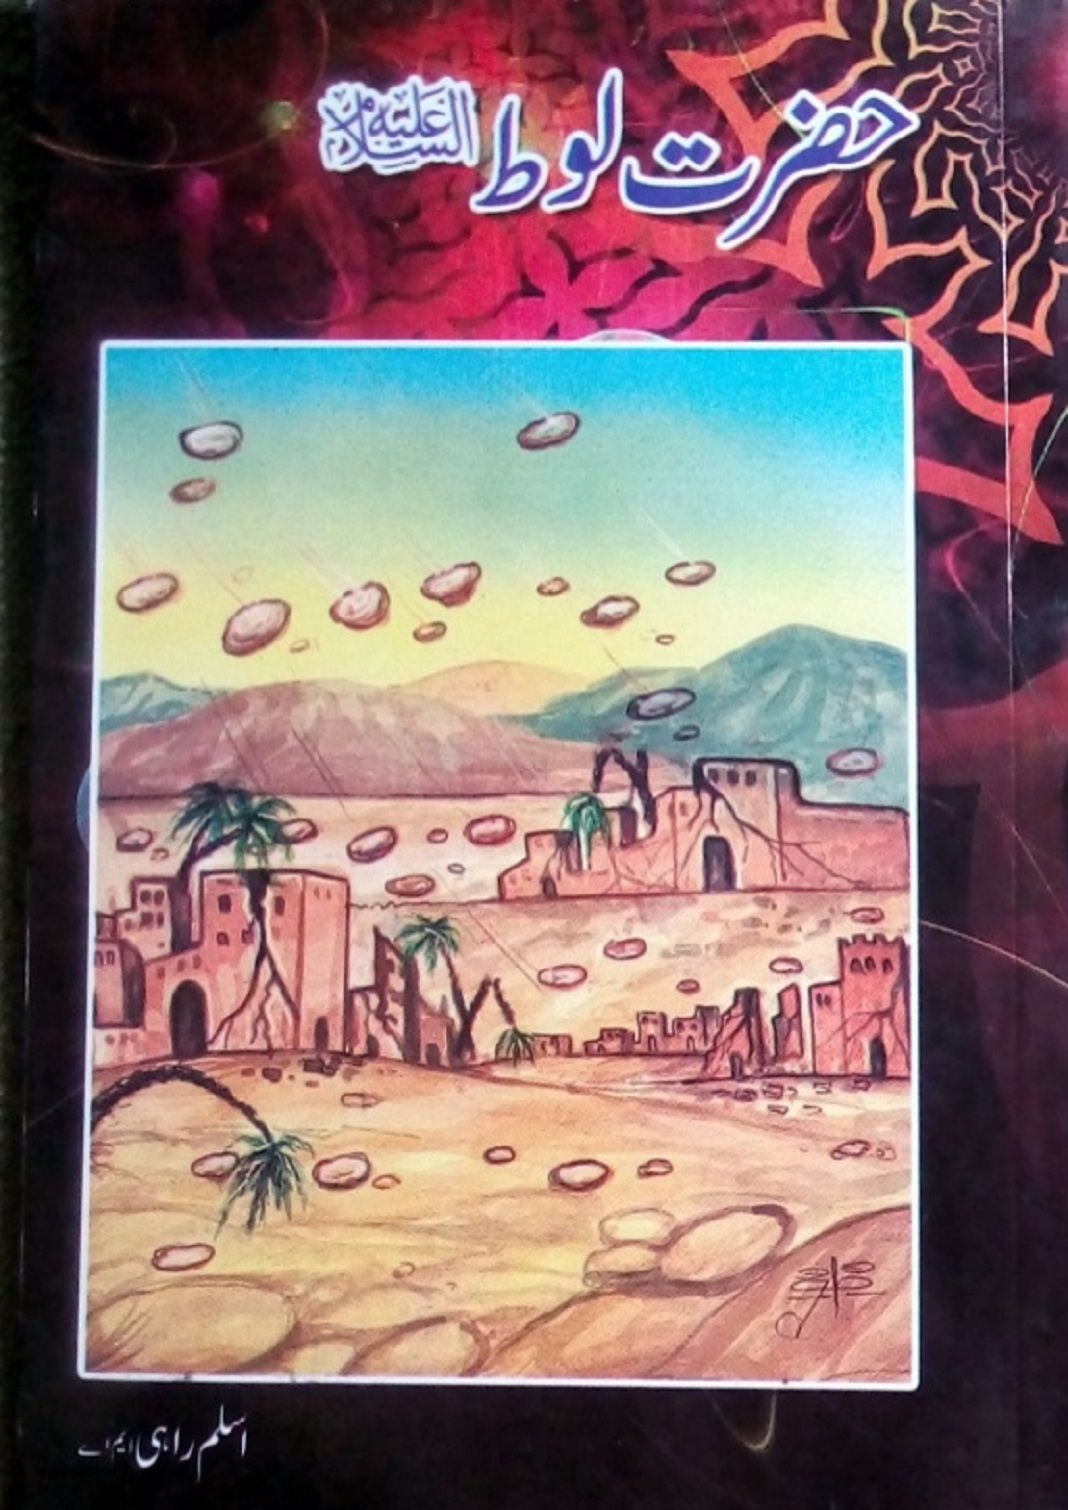 Hazrat Loot Lot Lut A.S Biography by Aslam Rahi MA, read